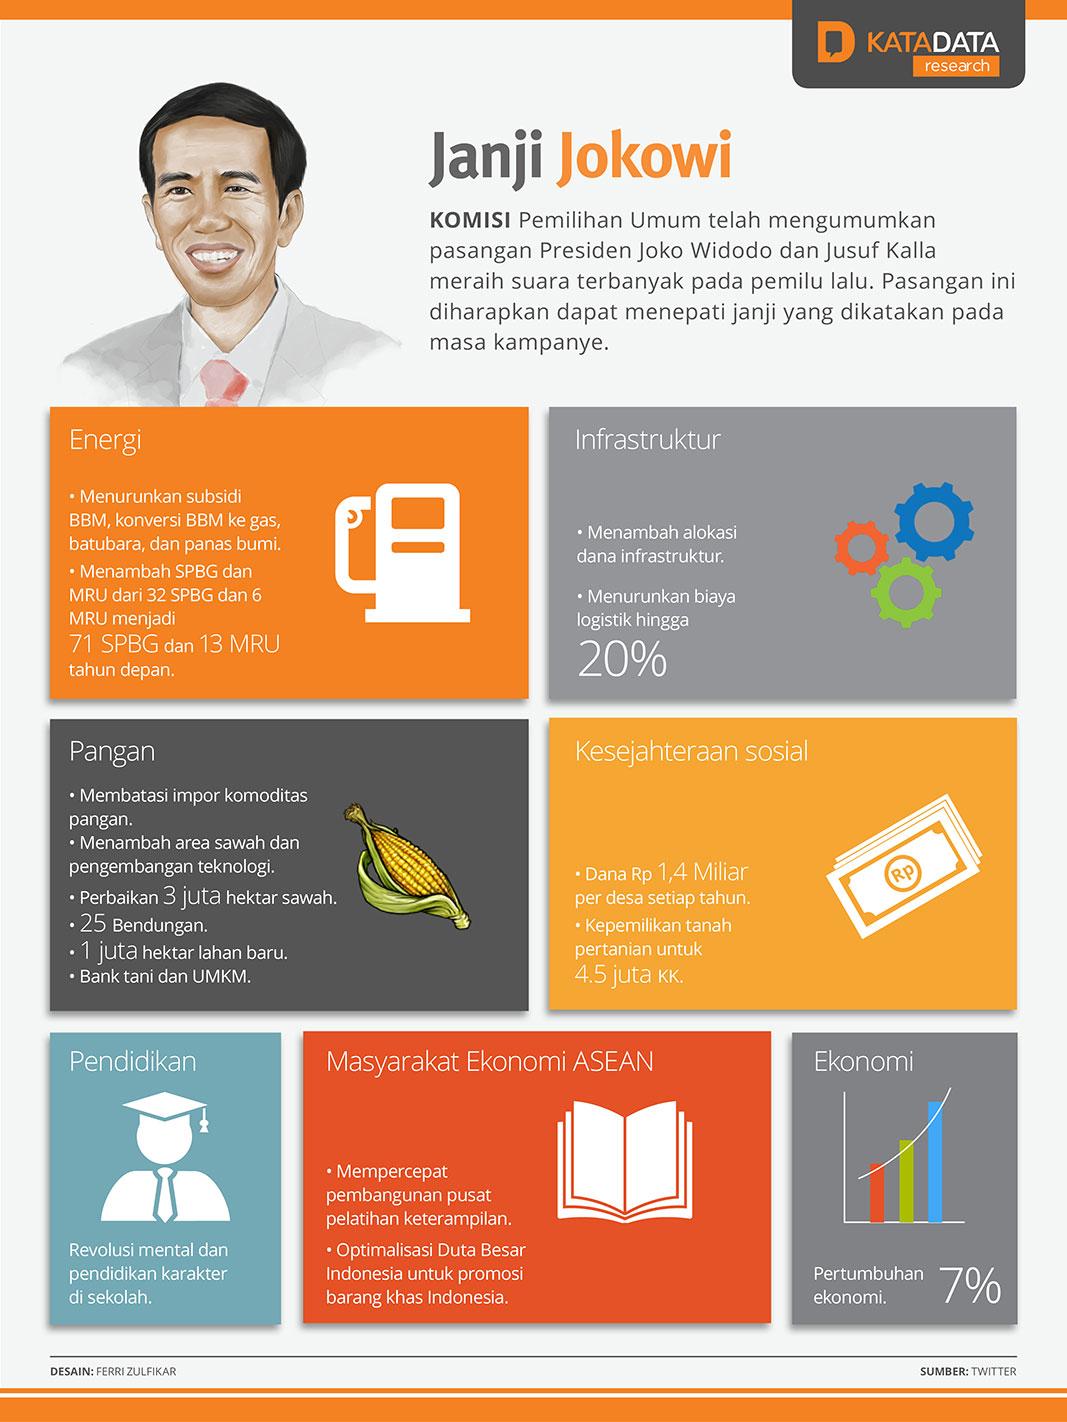 Jani Ekonomi Jokowi